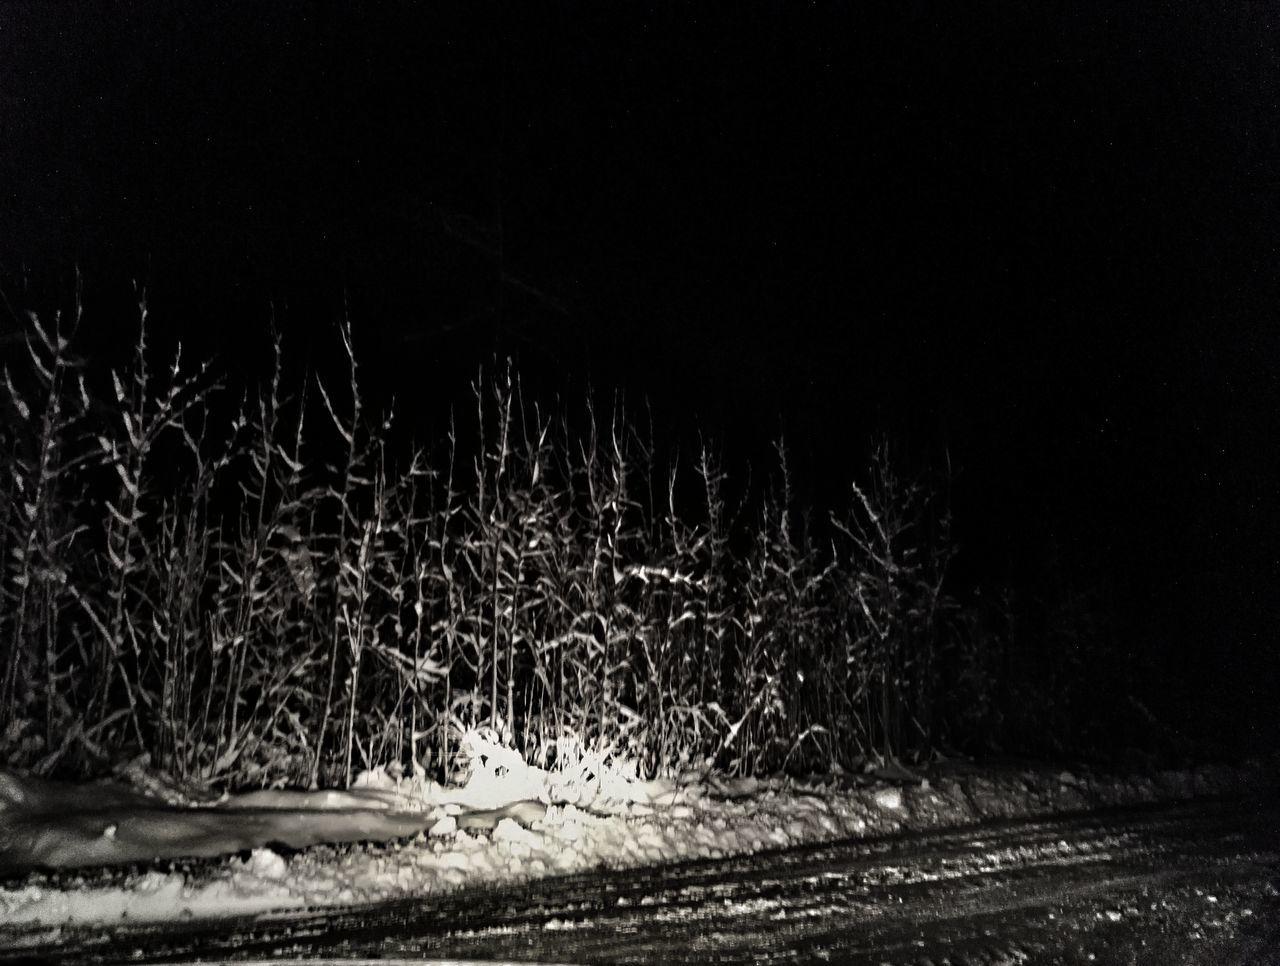 Night Tree Nature Black And White Enjoying Life Hello World Winter Cold Temperature Snow